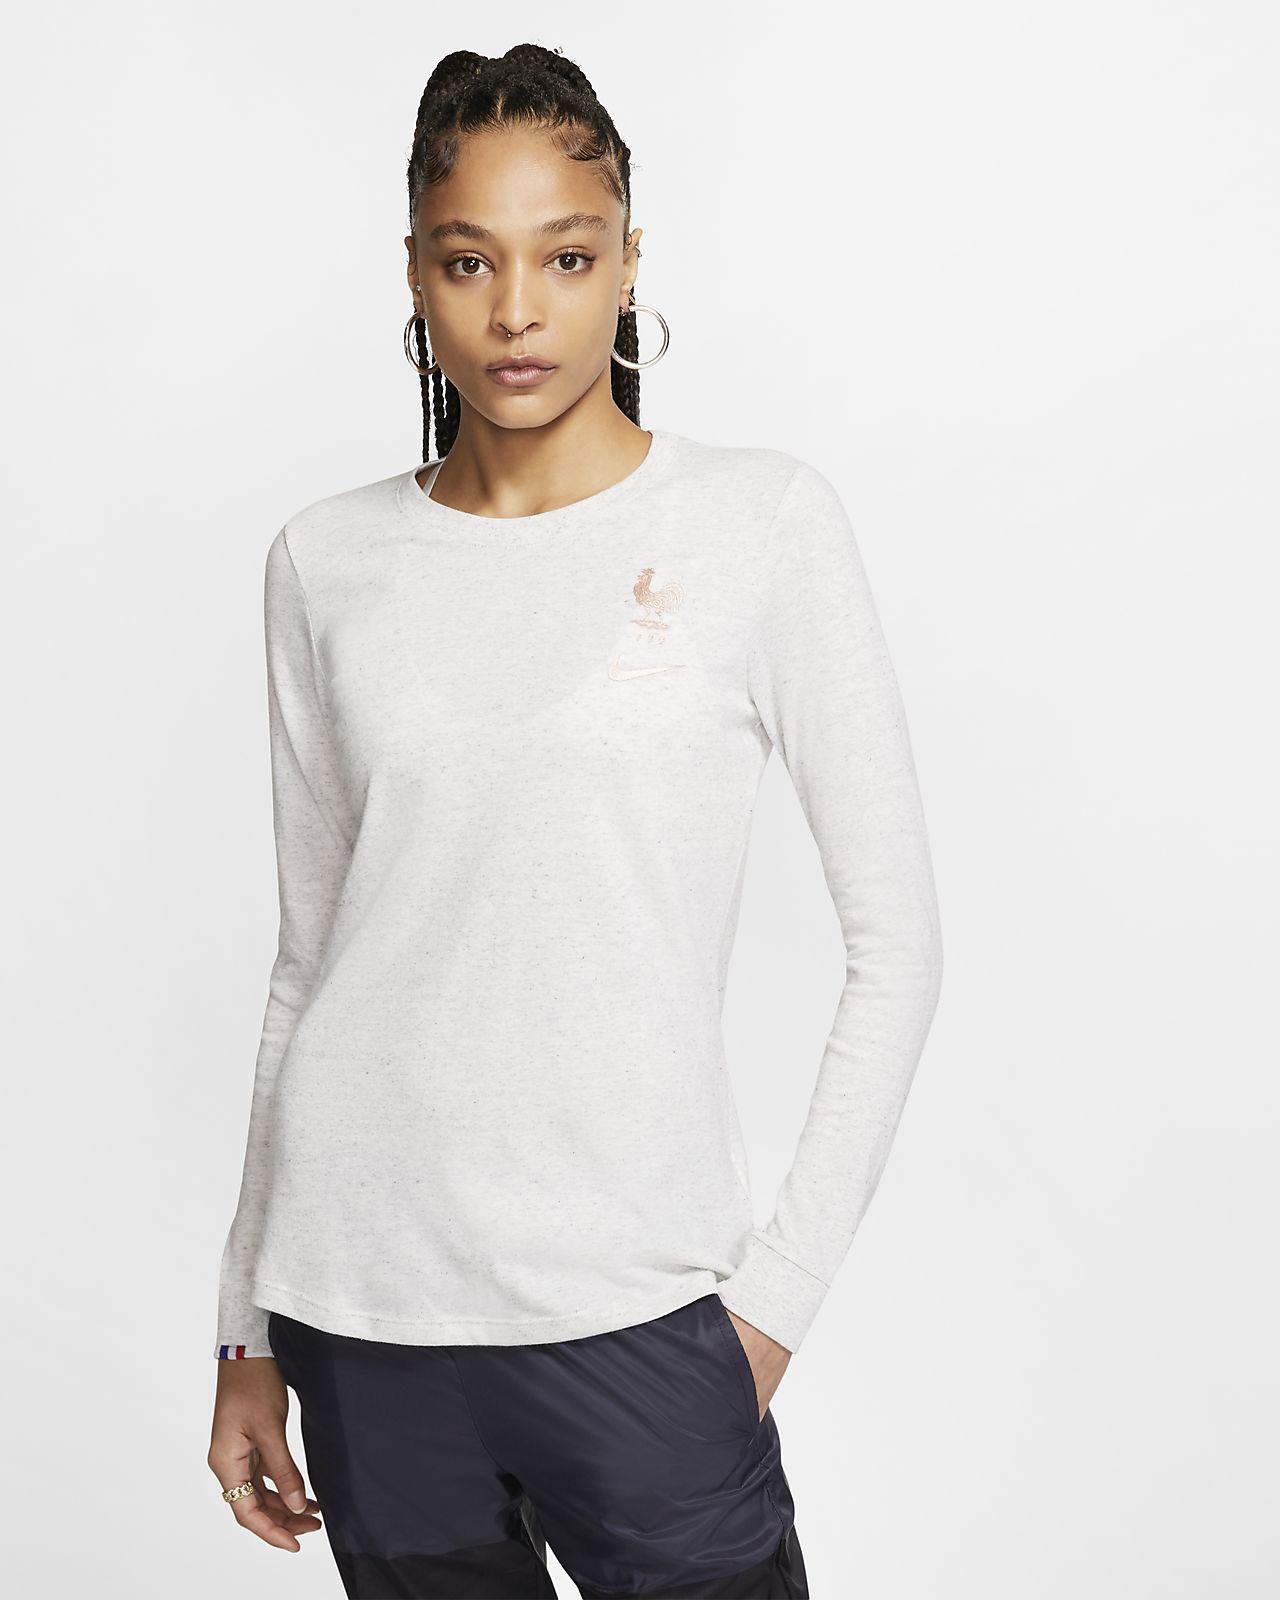 FFF Camiseta de fútbol de manga larga - Mujer